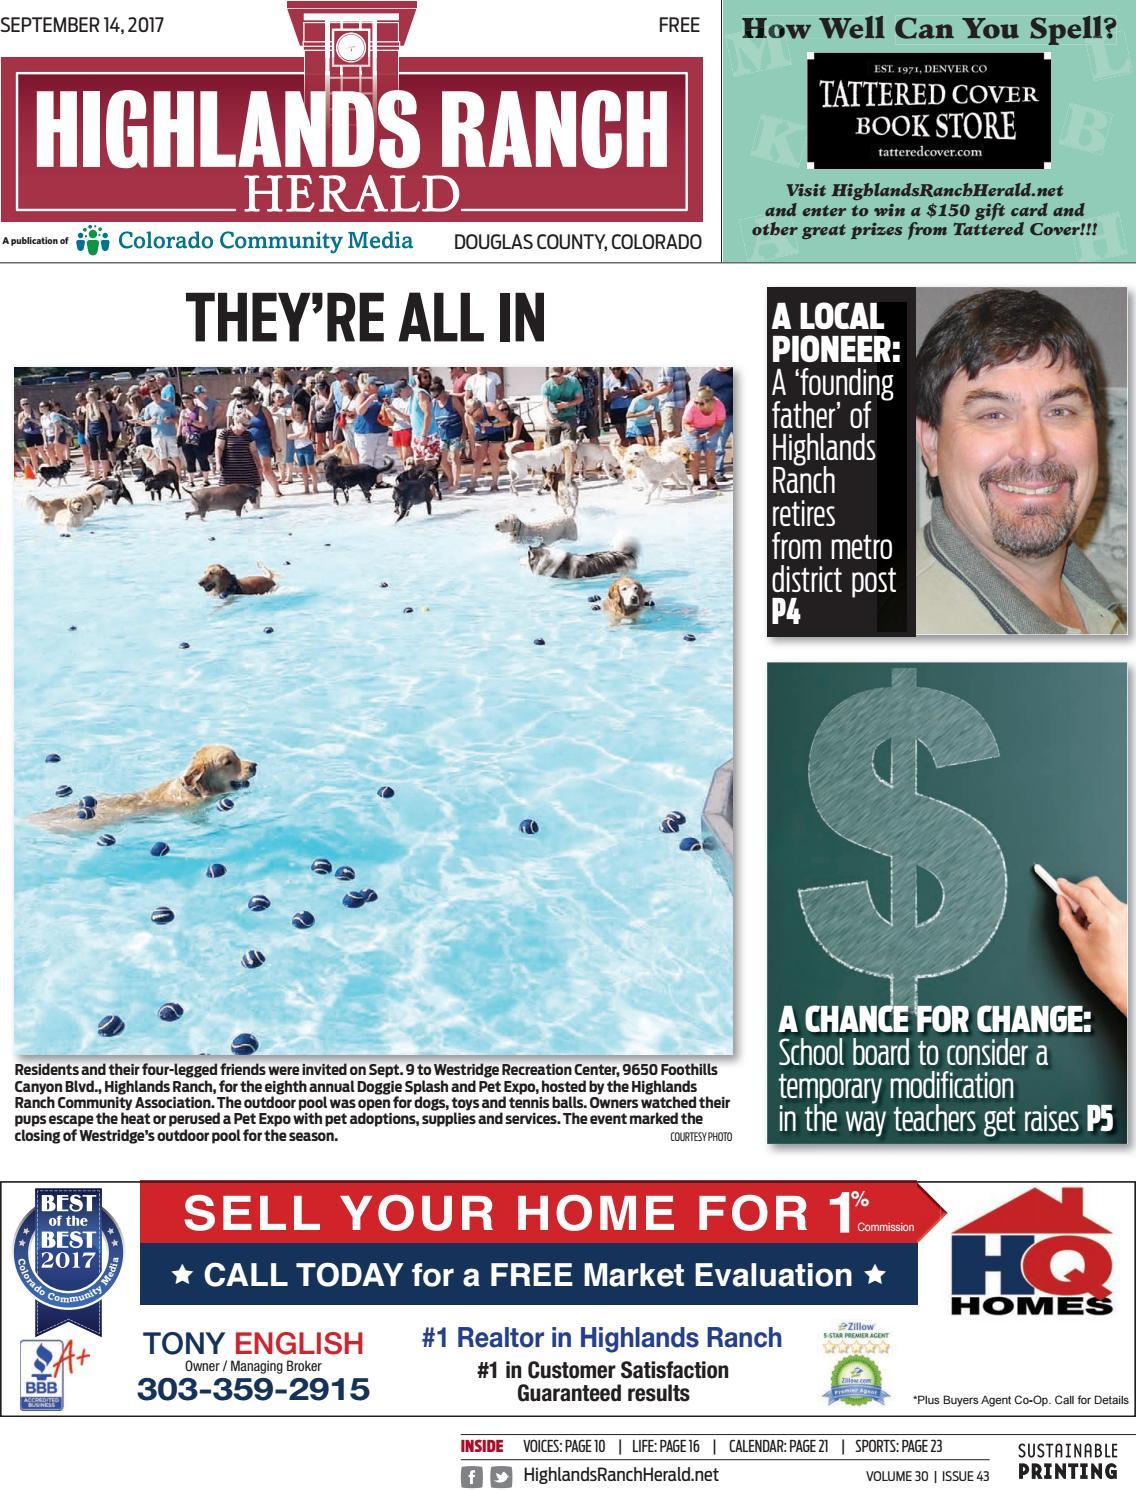 Highlands Ranch Herald 0914 by Colorado Community Media - issuu